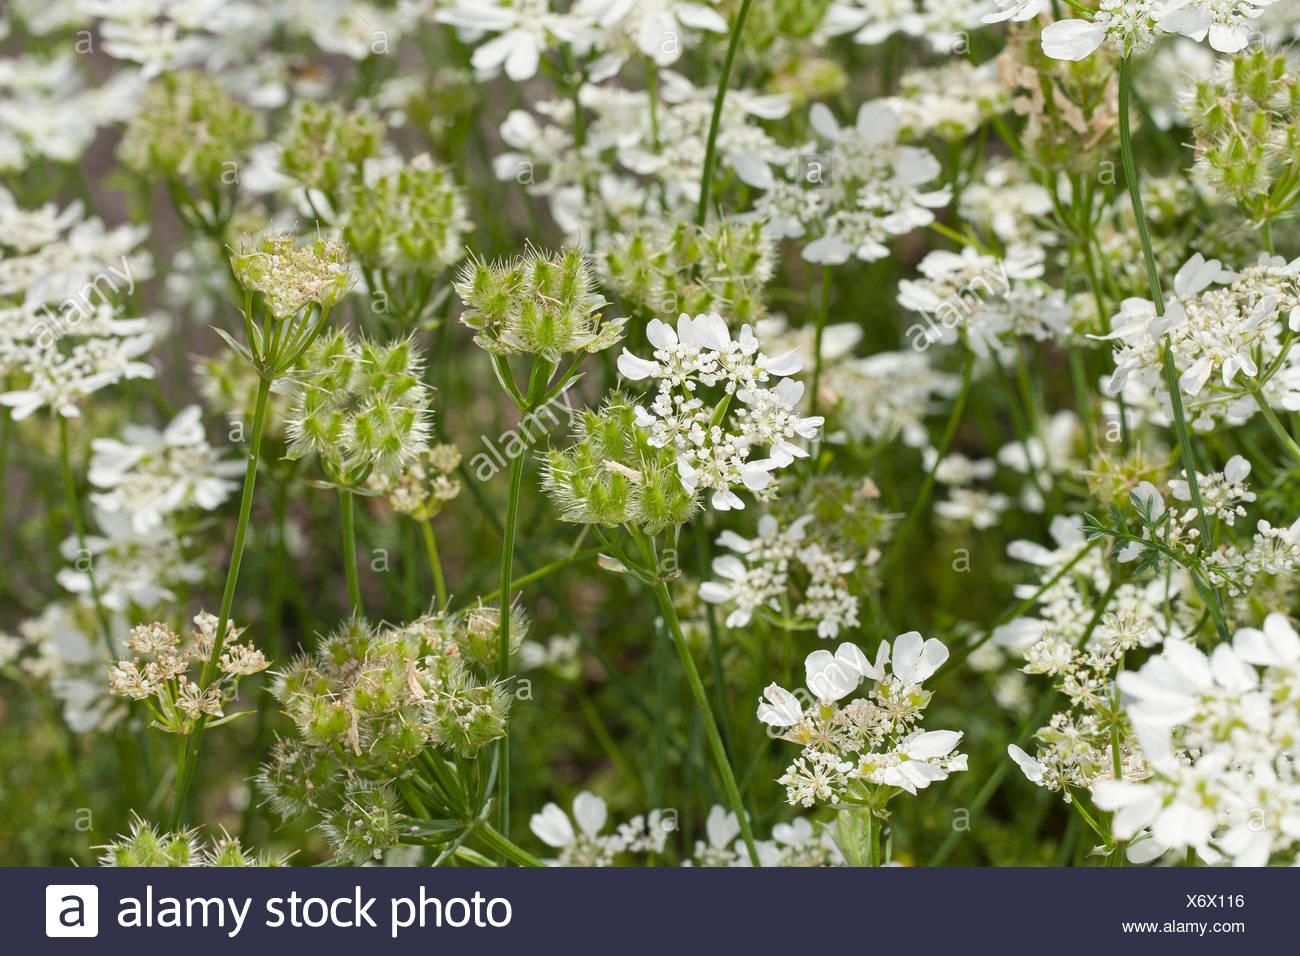 White lace flower, White laceflower, Minoan Lace (Orlaya grandiflora, Caucalis grandiflora), blooming, Germany Stock Photo